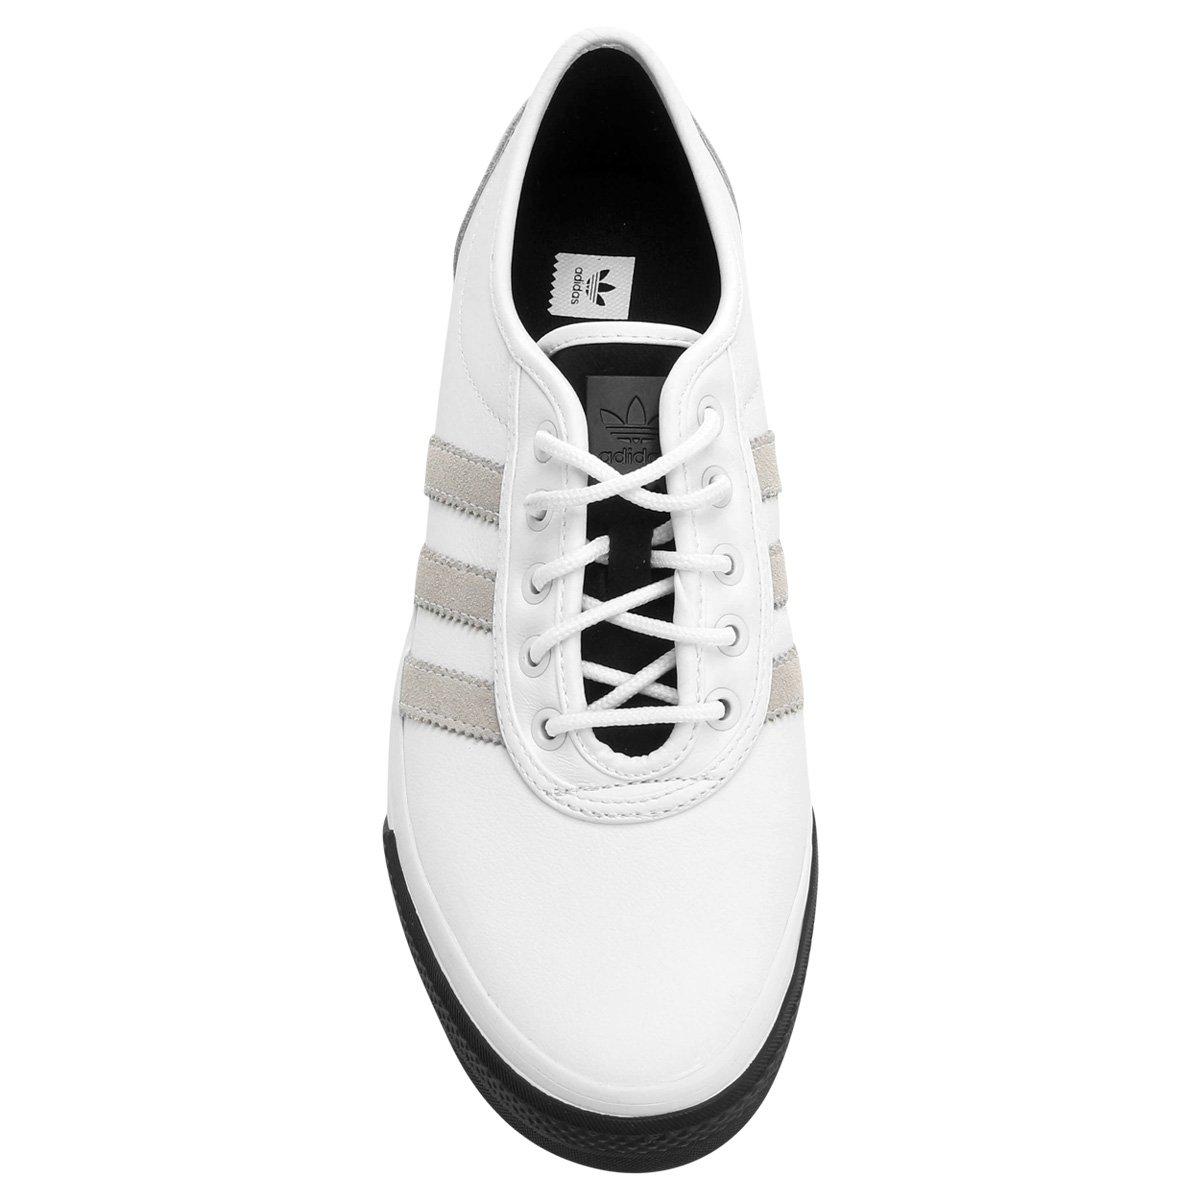 Tênis Adidas Adi Ease Class - Compre Agora  b03dba3931c